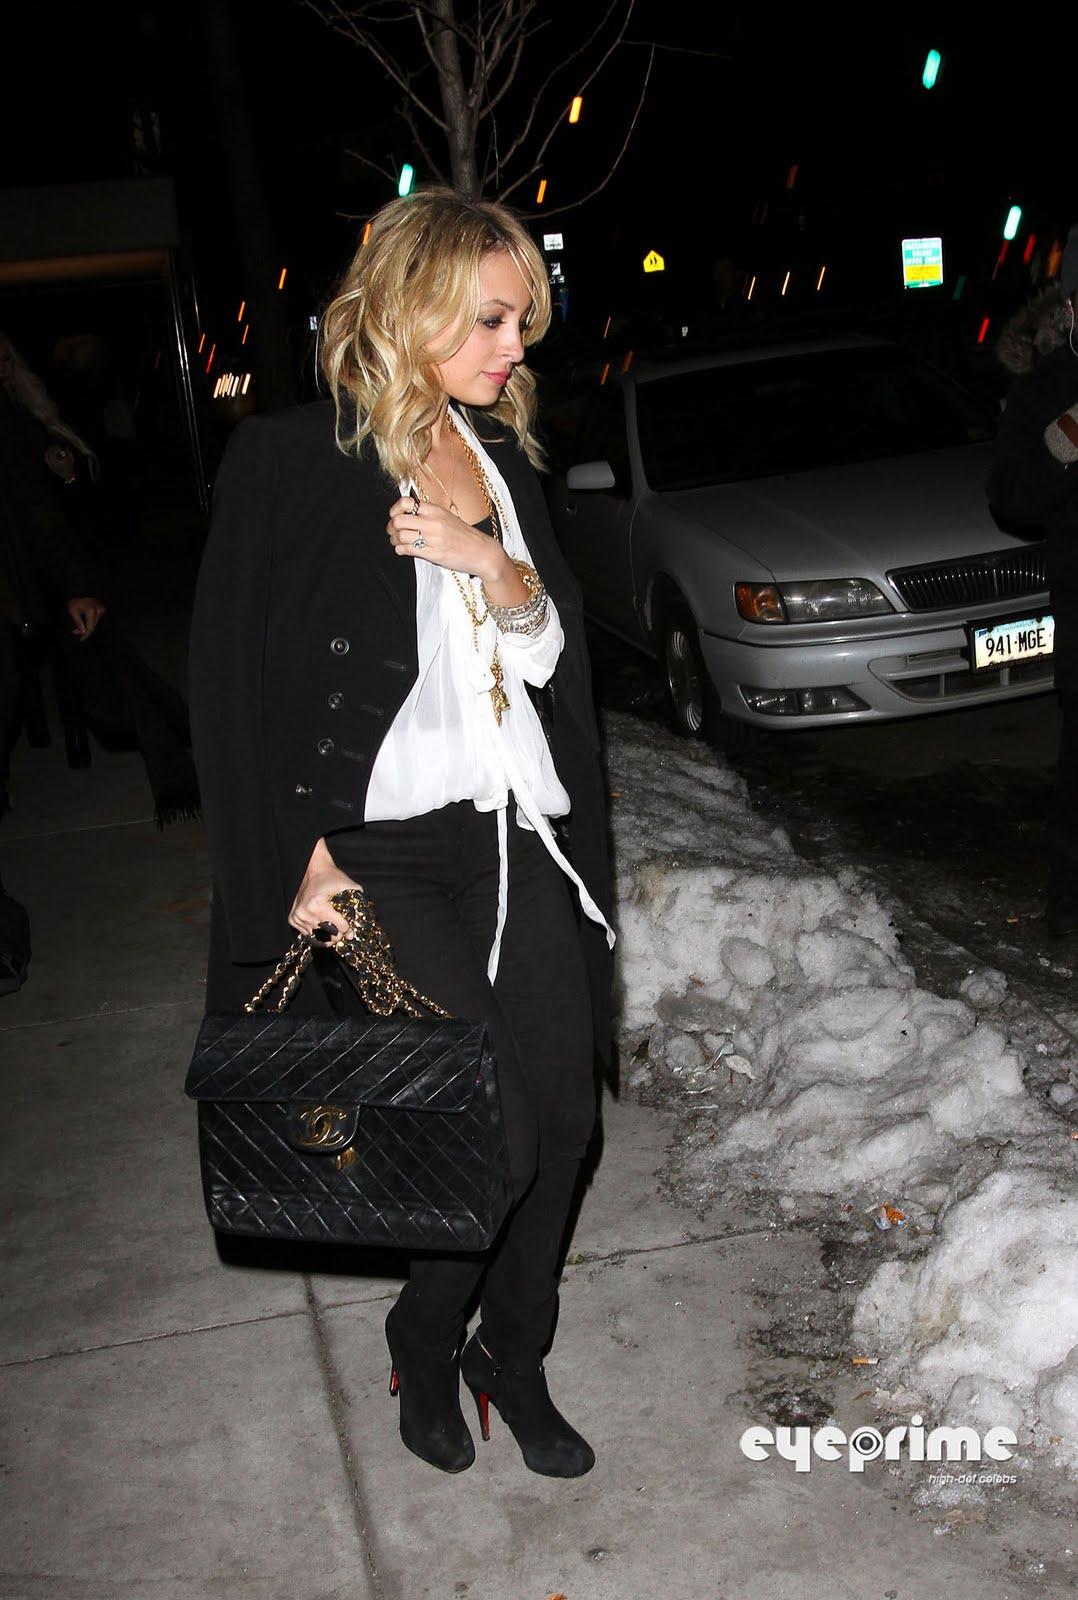 http://1.bp.blogspot.com/-R0aCXLqiC7g/TVaqK38JCvI/AAAAAAAAIPA/neNoF0FoLoQ/s1600/nicole-richie-kim-kardashian-2.jpg